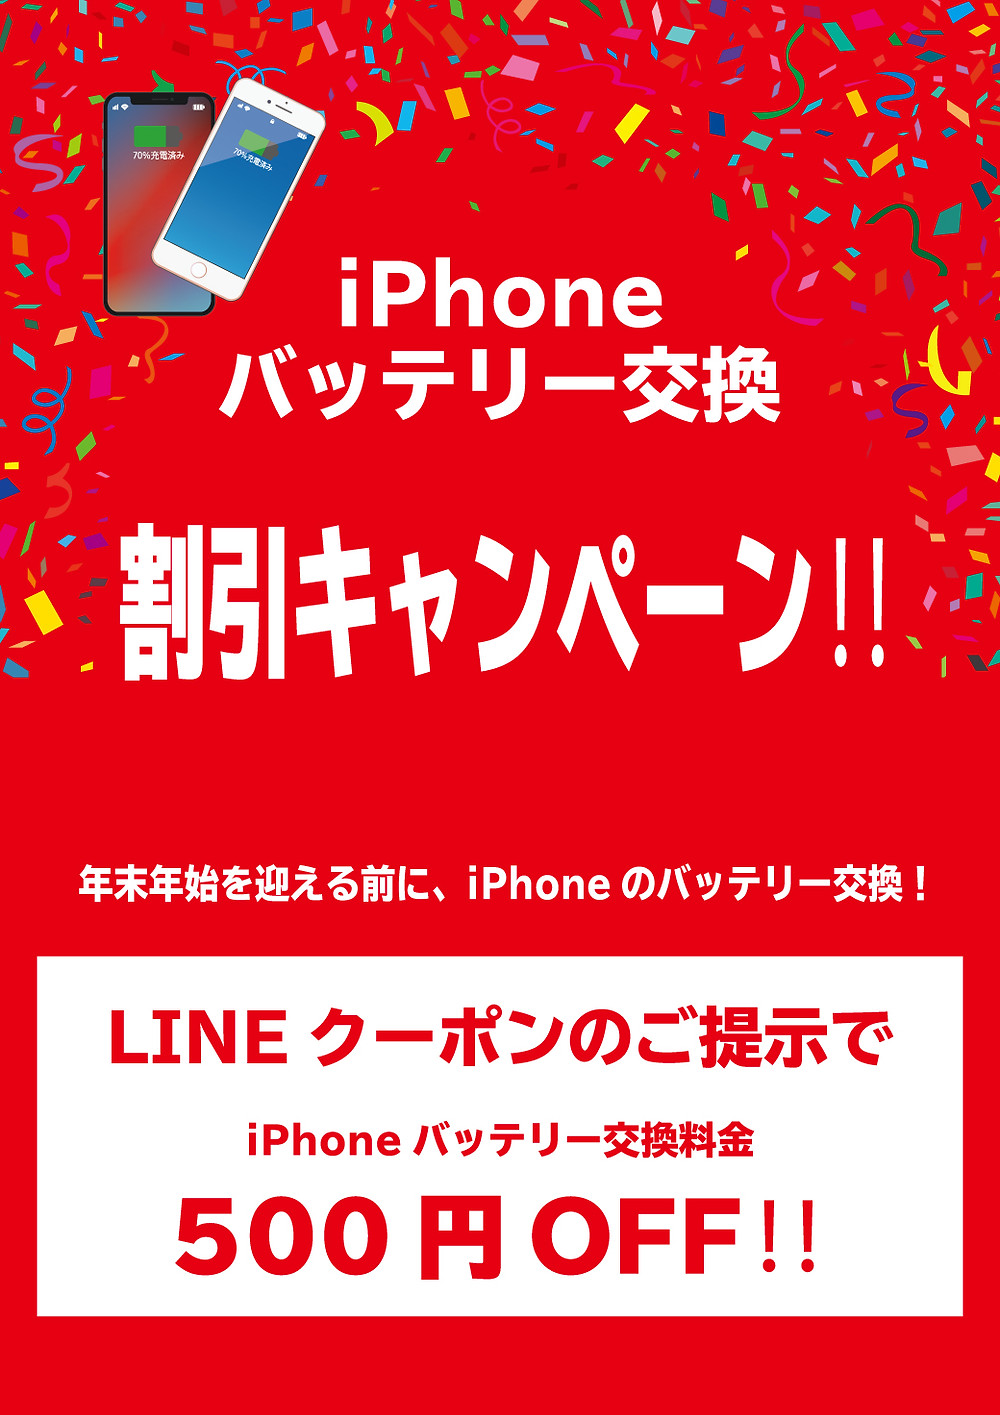 iPhoneバッテリー交換が期間限定でお得!